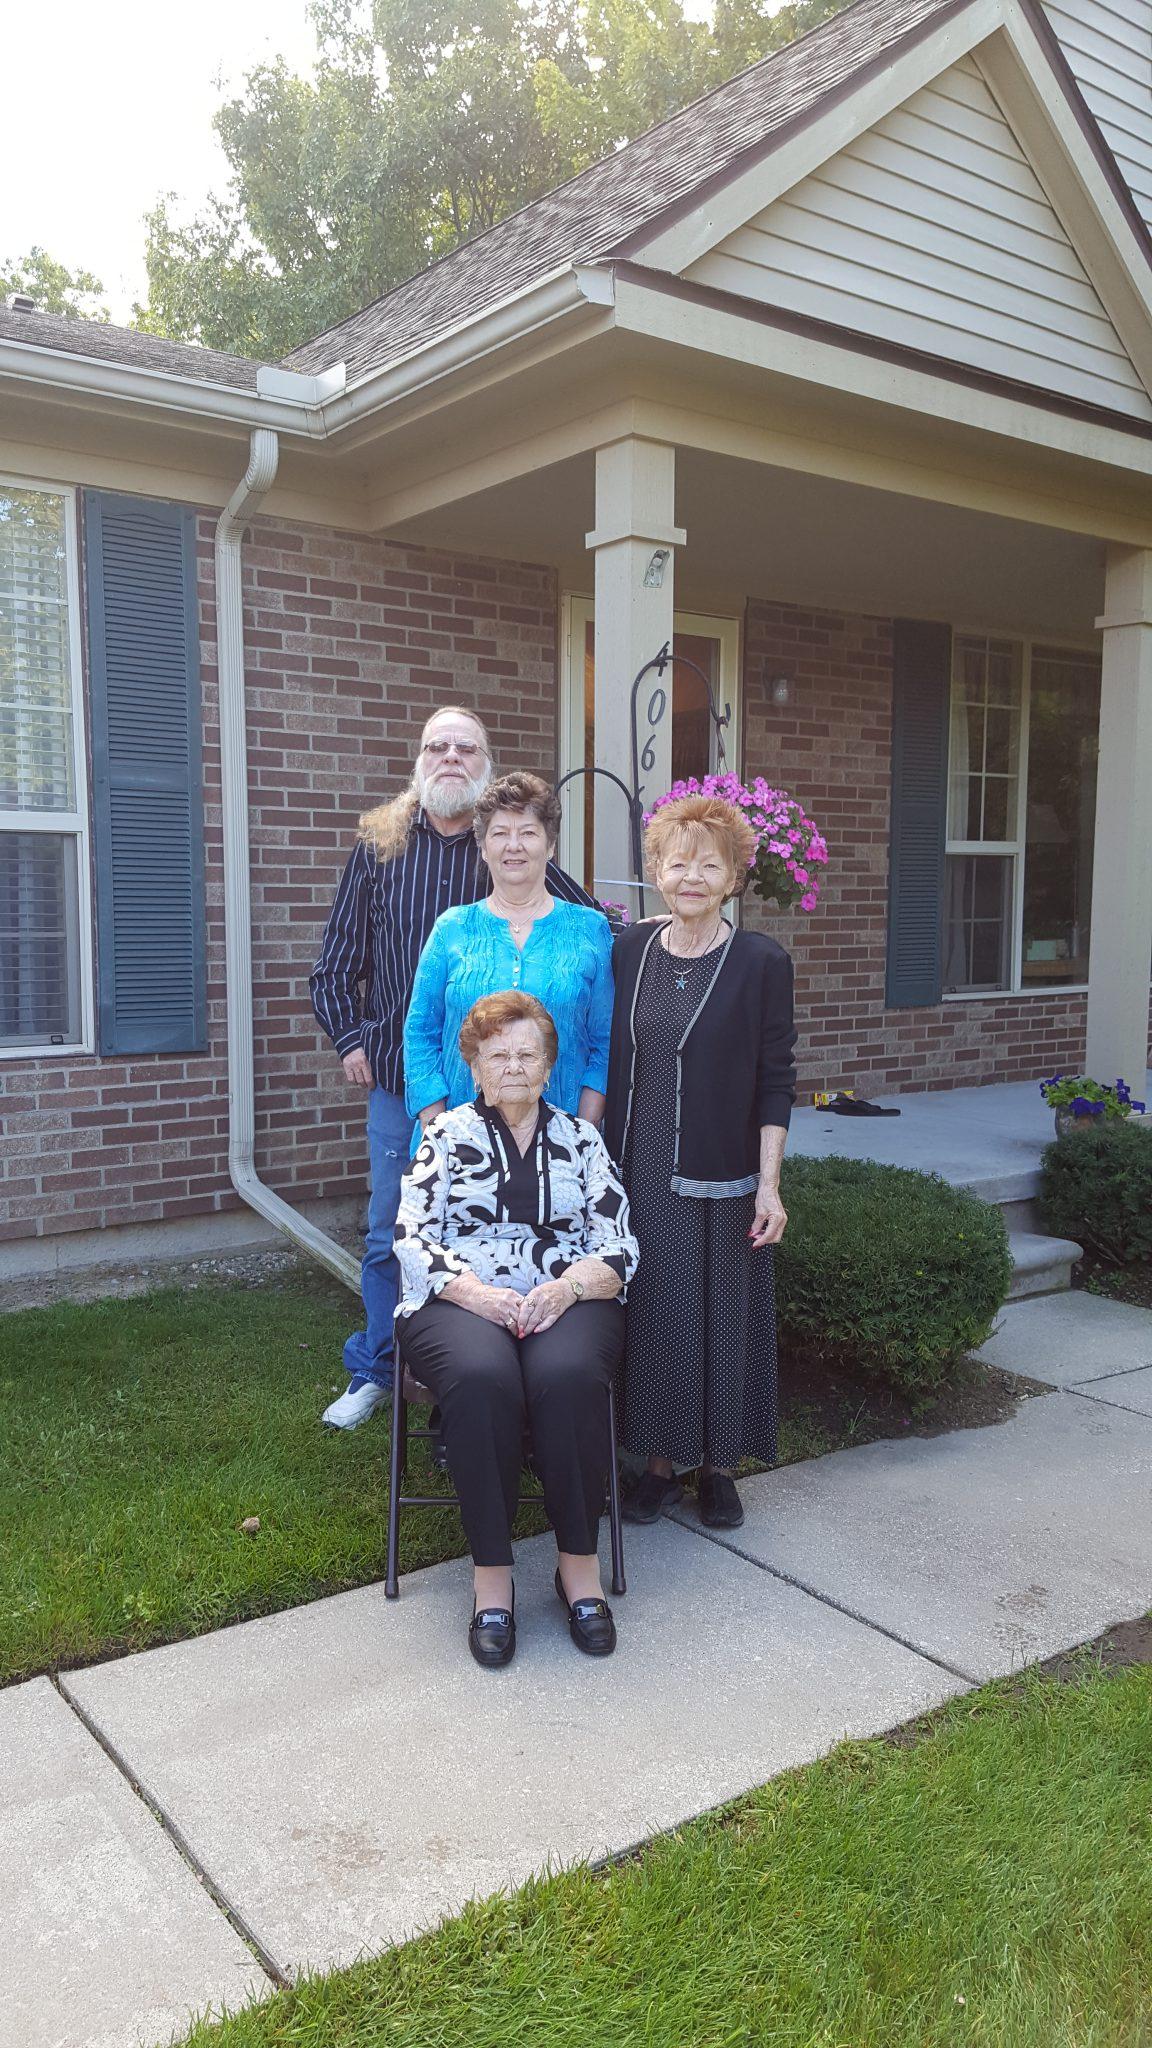 2017 Aunt Ruby's 100th Birthday